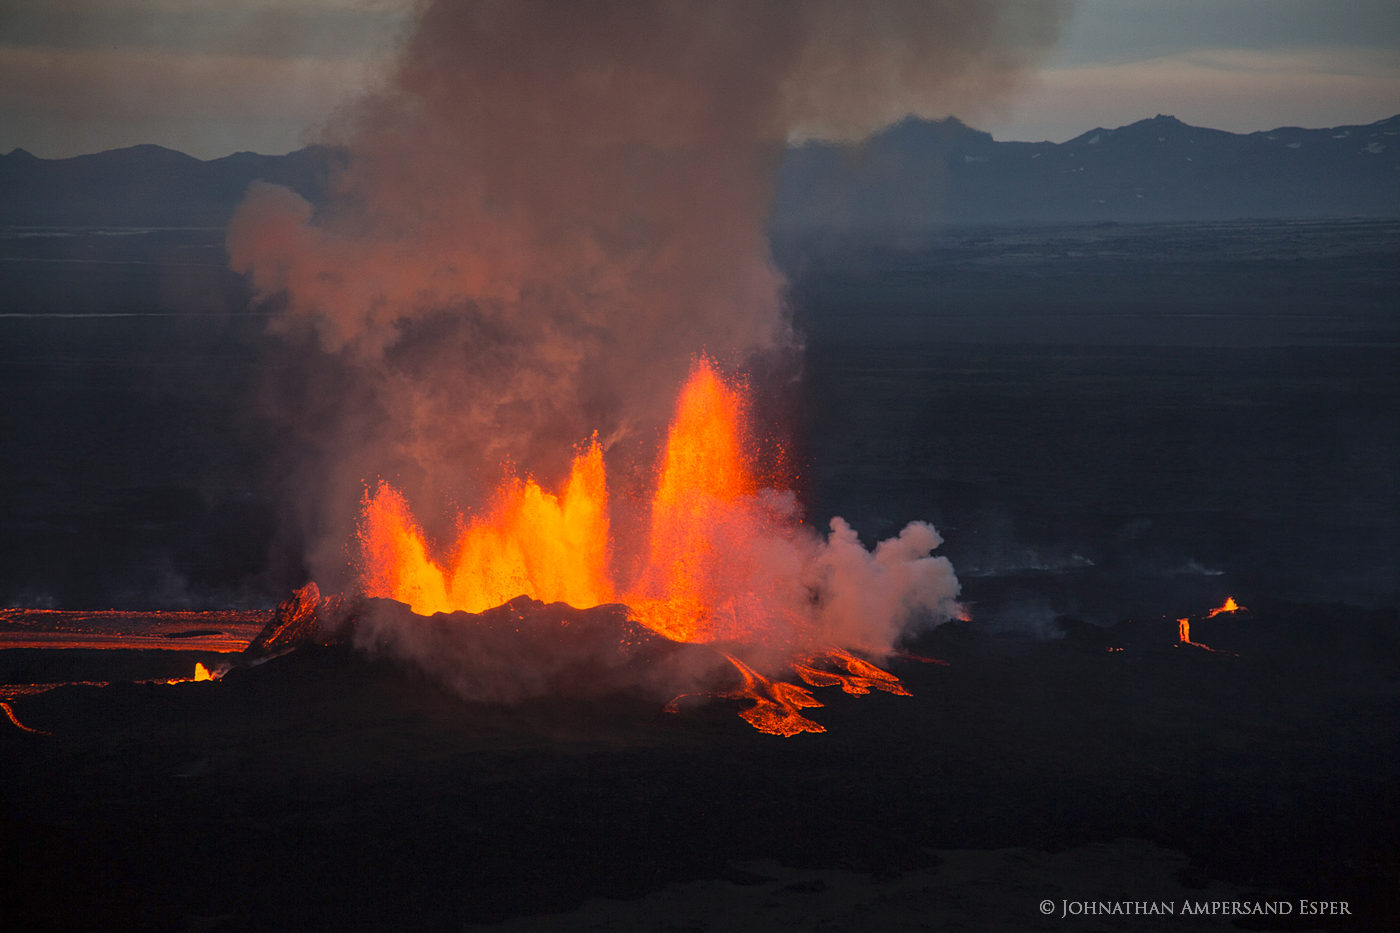 Bárðarbunga, Dyngjujökull, Iceland, aurora borealis, fissure, green, lava flow, night, northern lights, road, track, wide open, photo